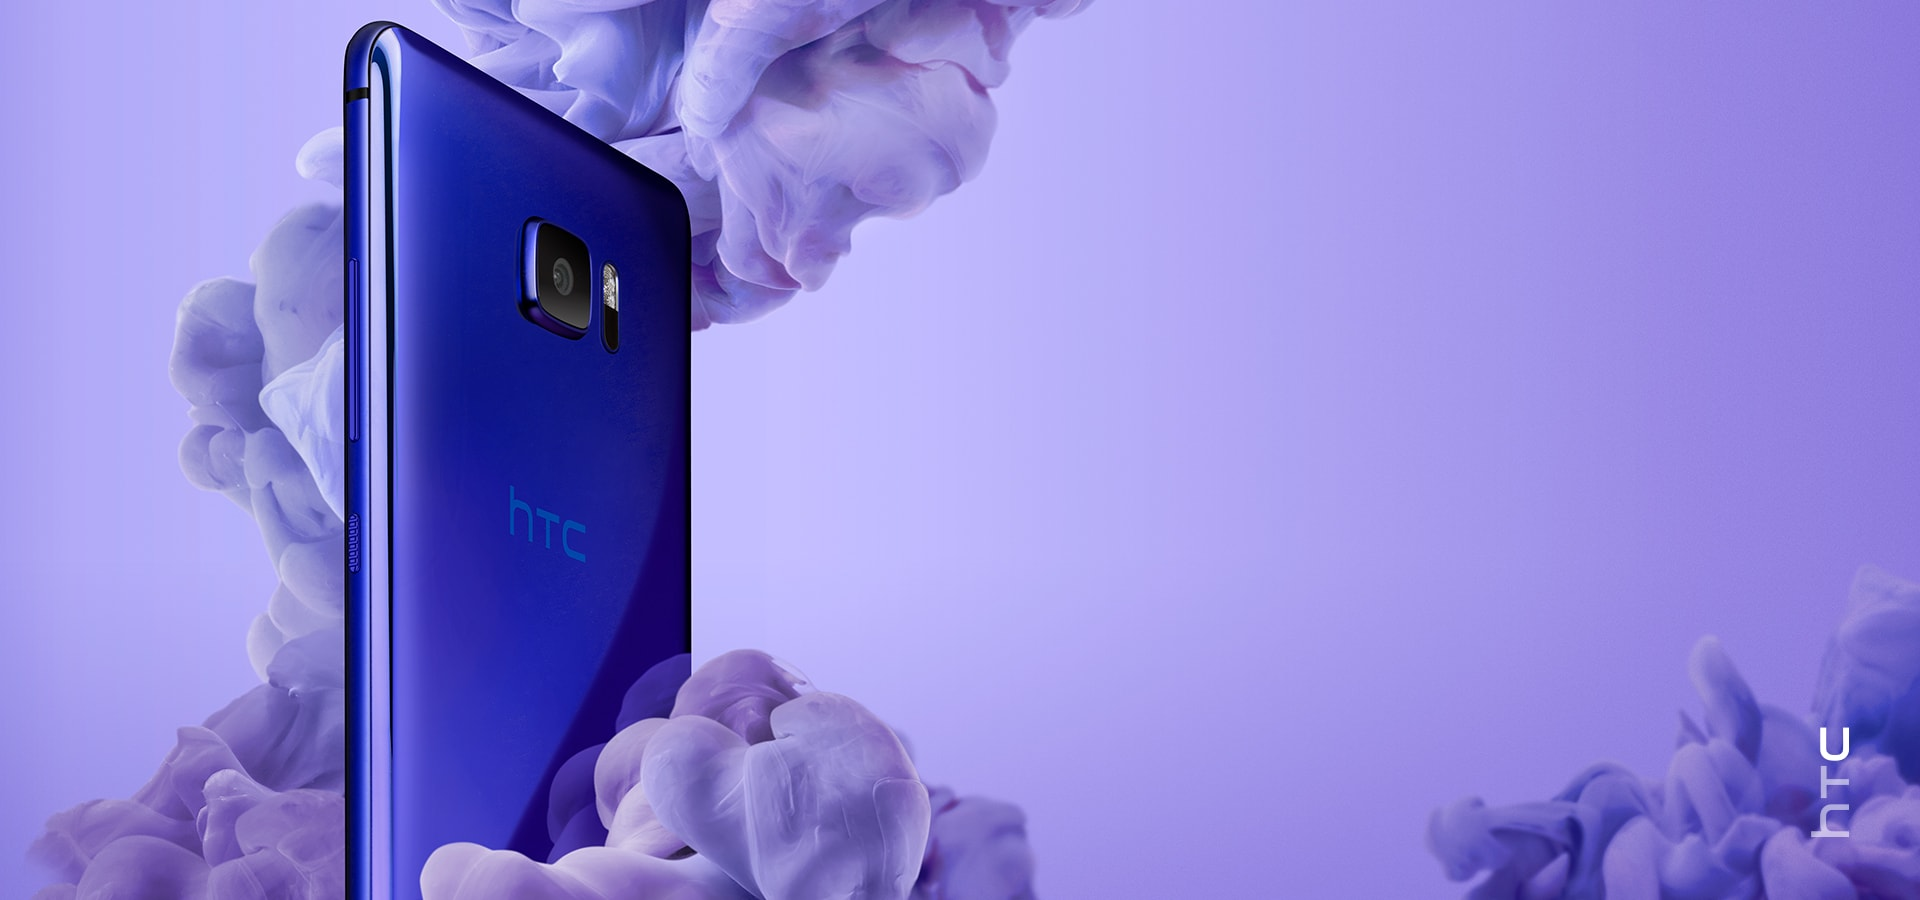 HTC U Ultra hero